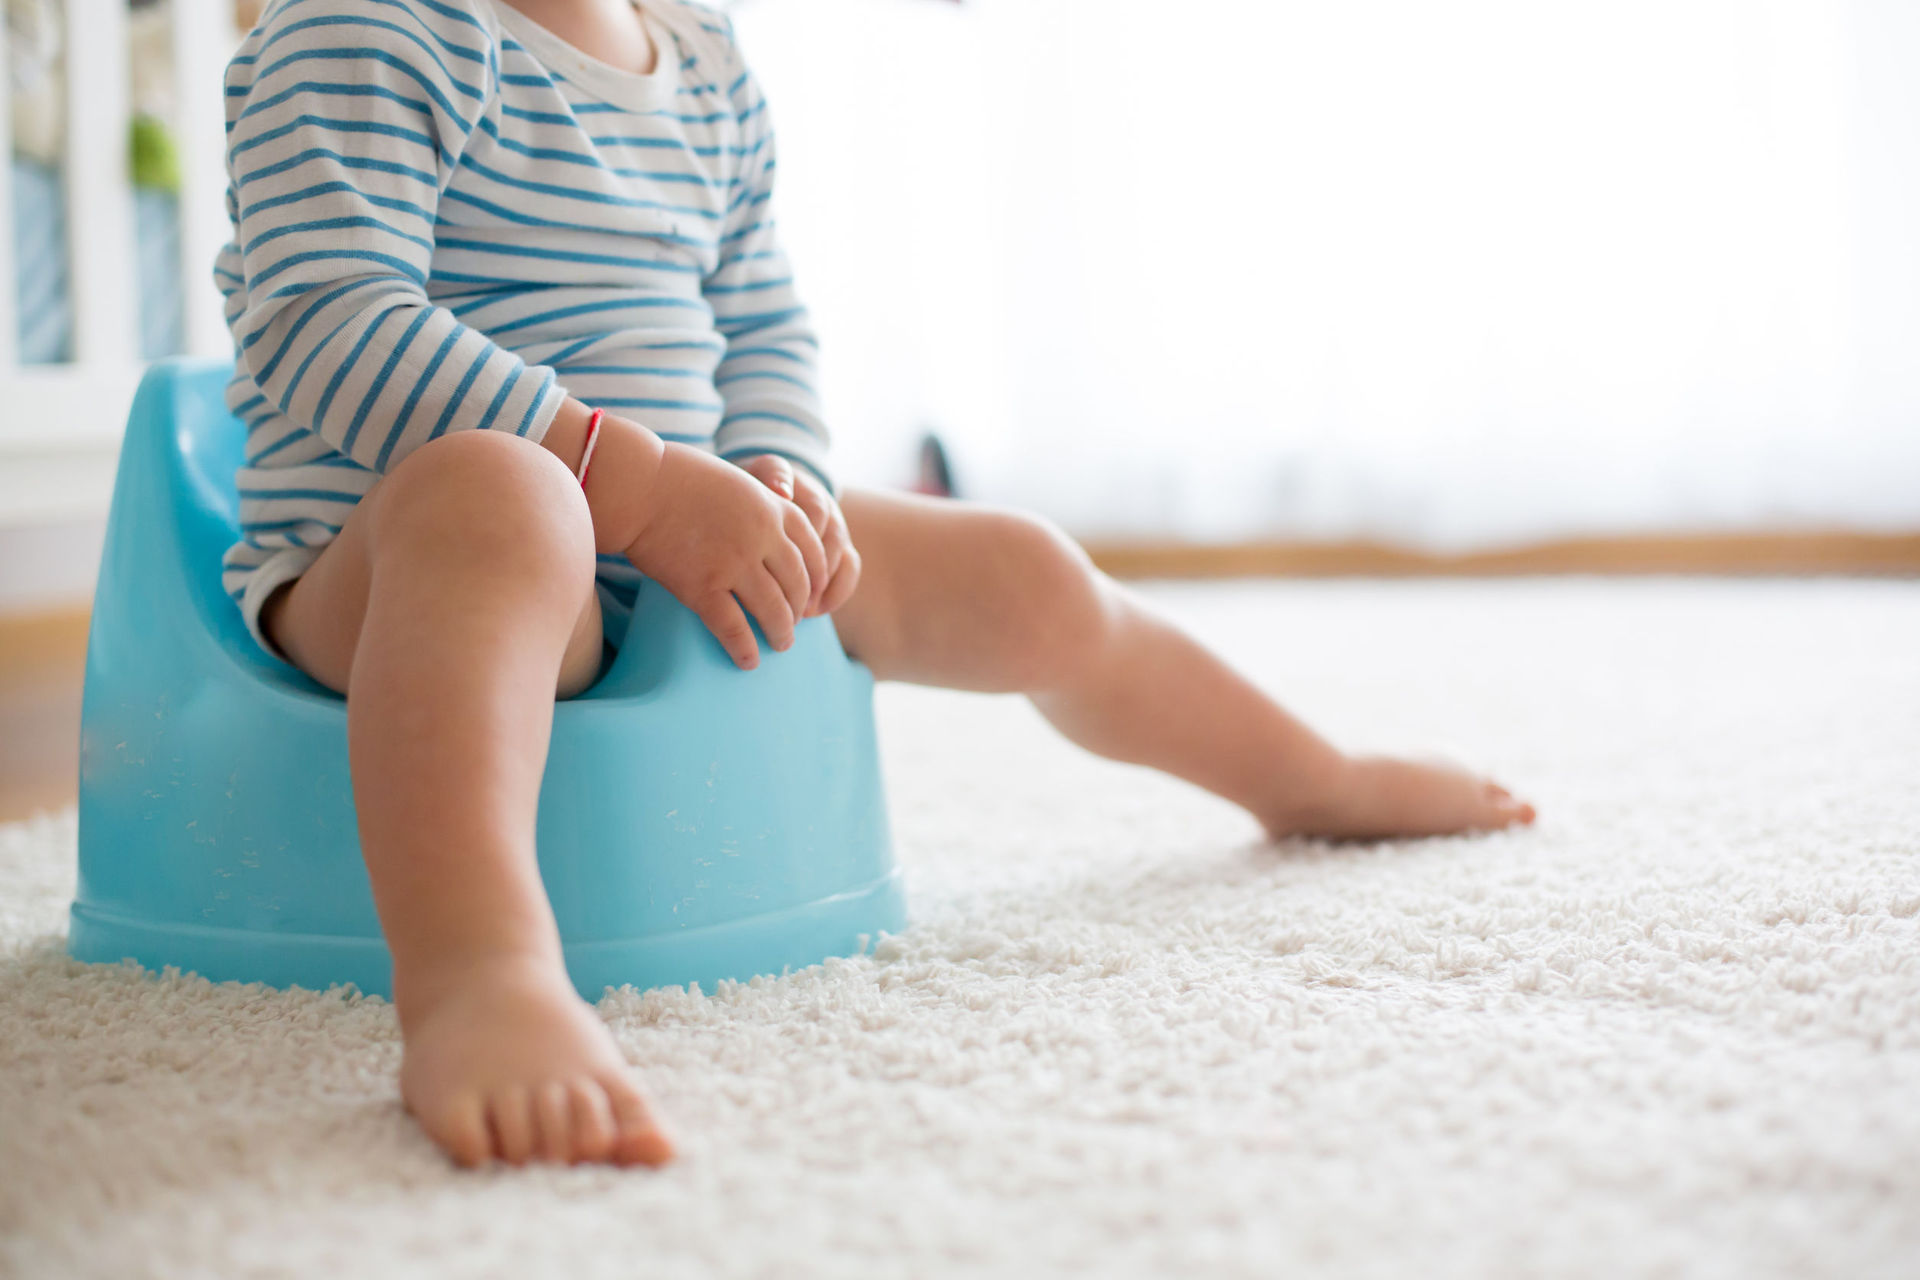 Mum praised for clever toddler toilet training hack